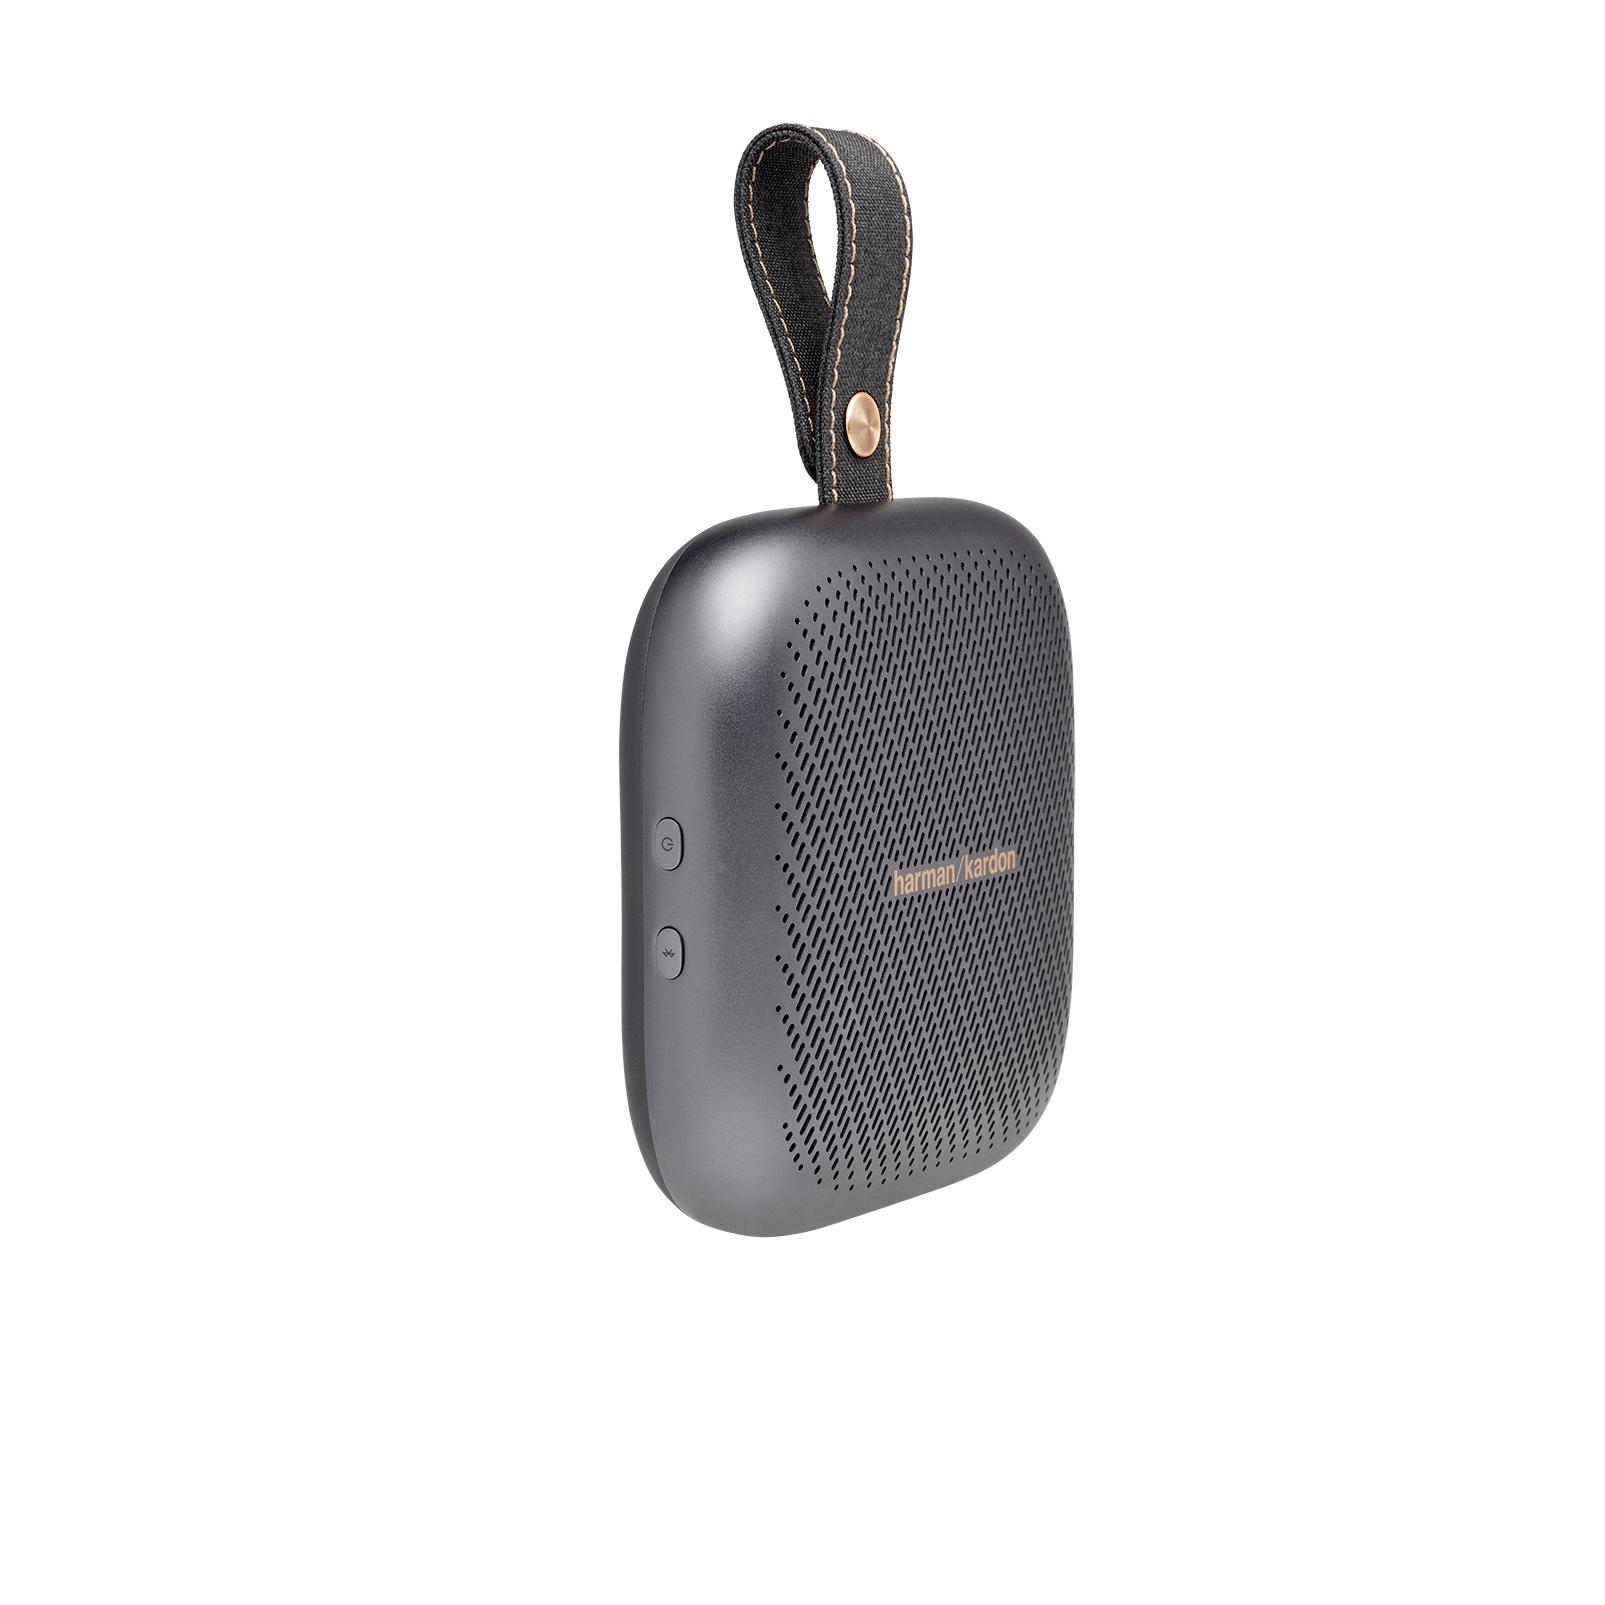 Harman Kardon Neo - Space Gray - Portable Bluetooth speaker - Detailshot 2